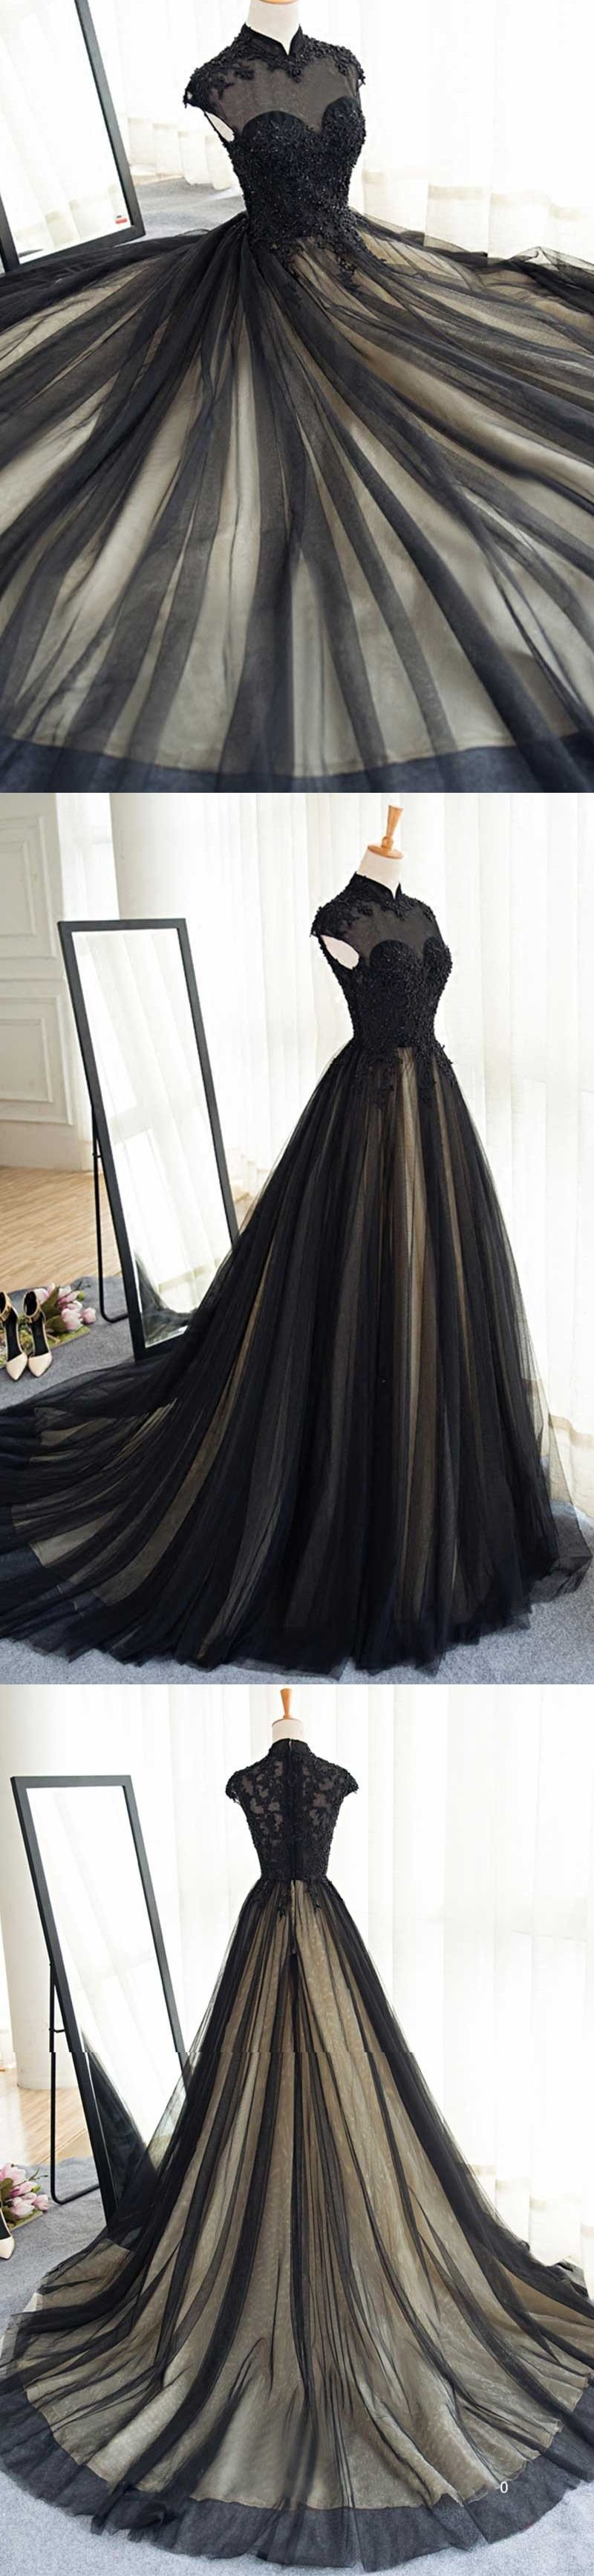 5c8bc471ed8 Black Prom Dresses High Neck Sweep Brush Train Rhinestone Prom Dress Evening  Dress JKL394 annapromdress  prom  promdress  evening  eveningdress  dance  ...